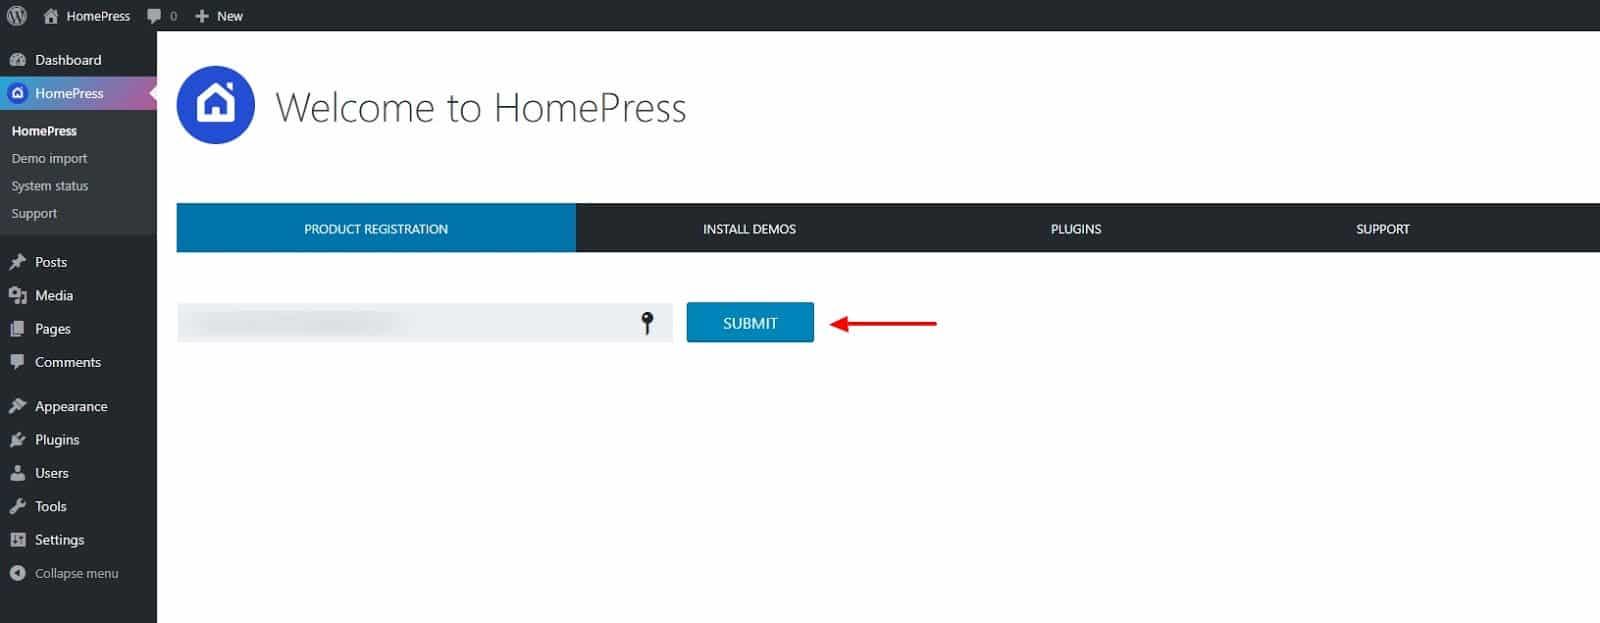 HomePress welcome screen